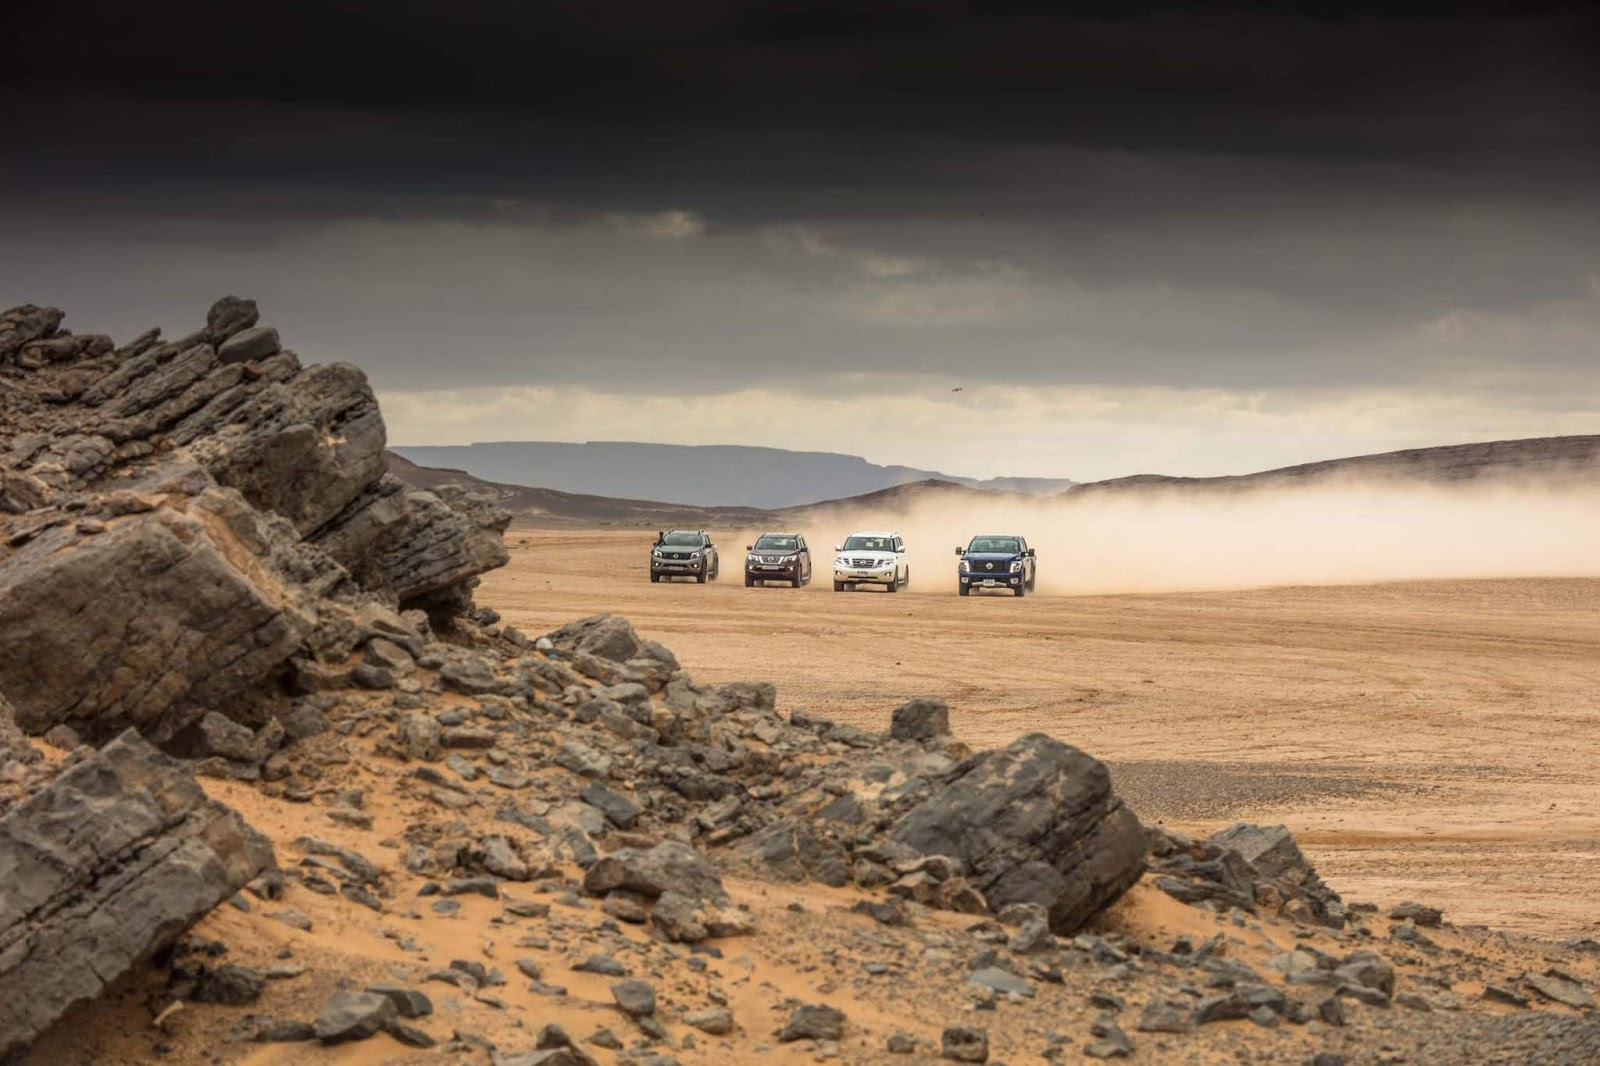 Nissan2BMorocco 2B252832529 Δες τα all terrain οχήματα της Nissan να... δαμάζουν τη Σαχάρα Nissan, Nissan navara, Offroad, video, videos, ΦΩΤΟ